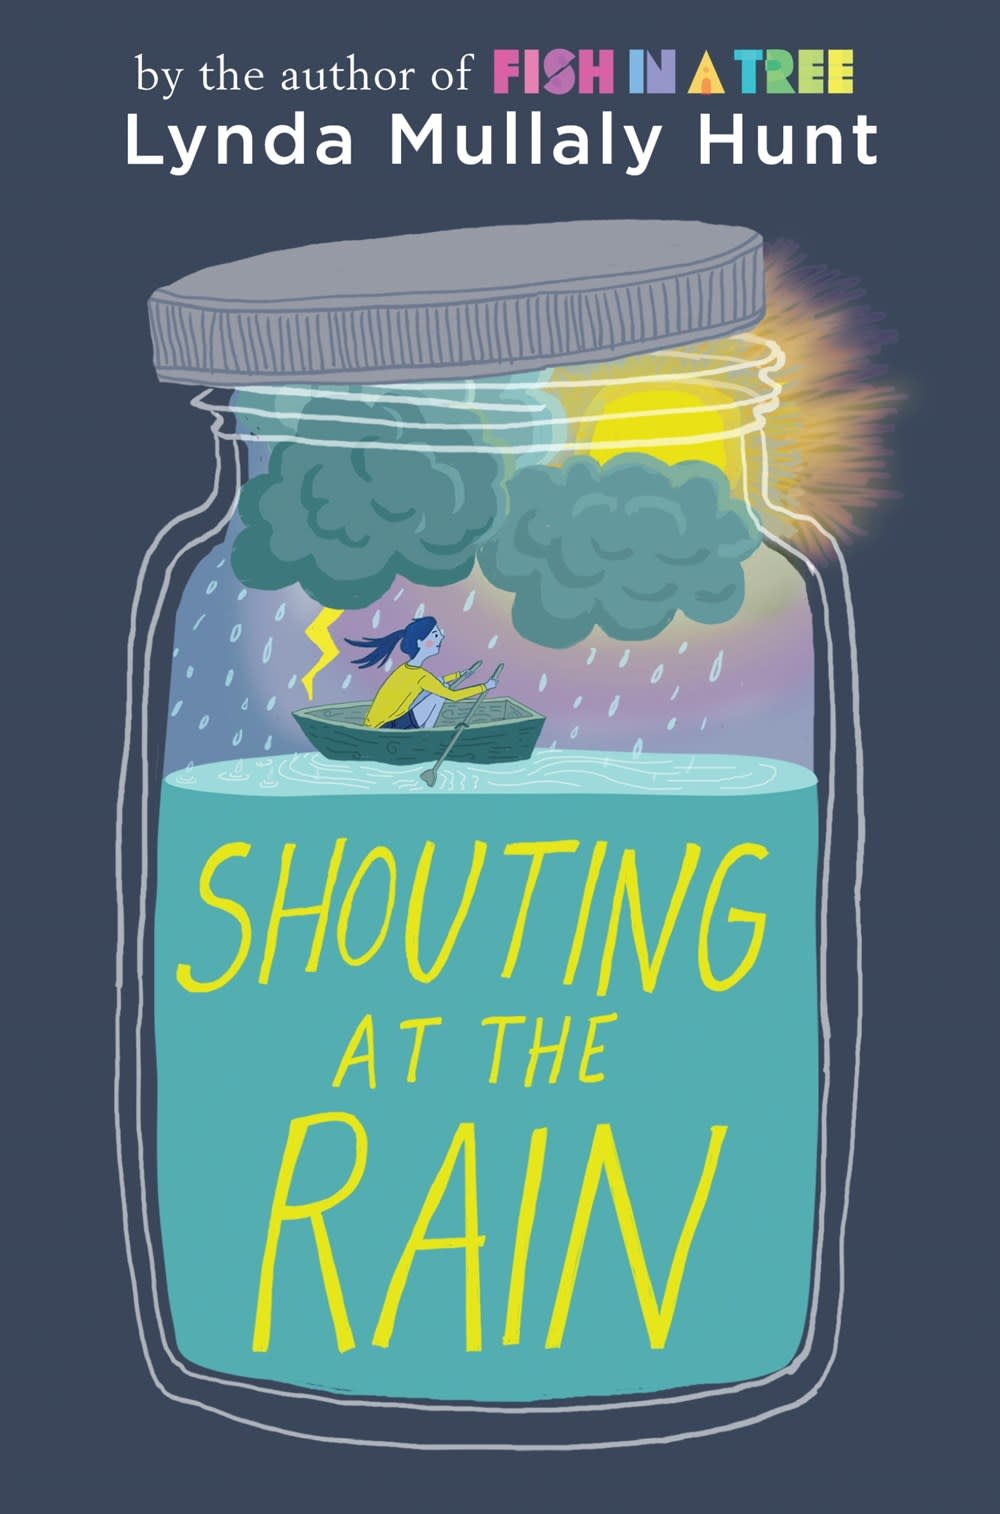 Nancy Paulsen Books Shouting at the Rain